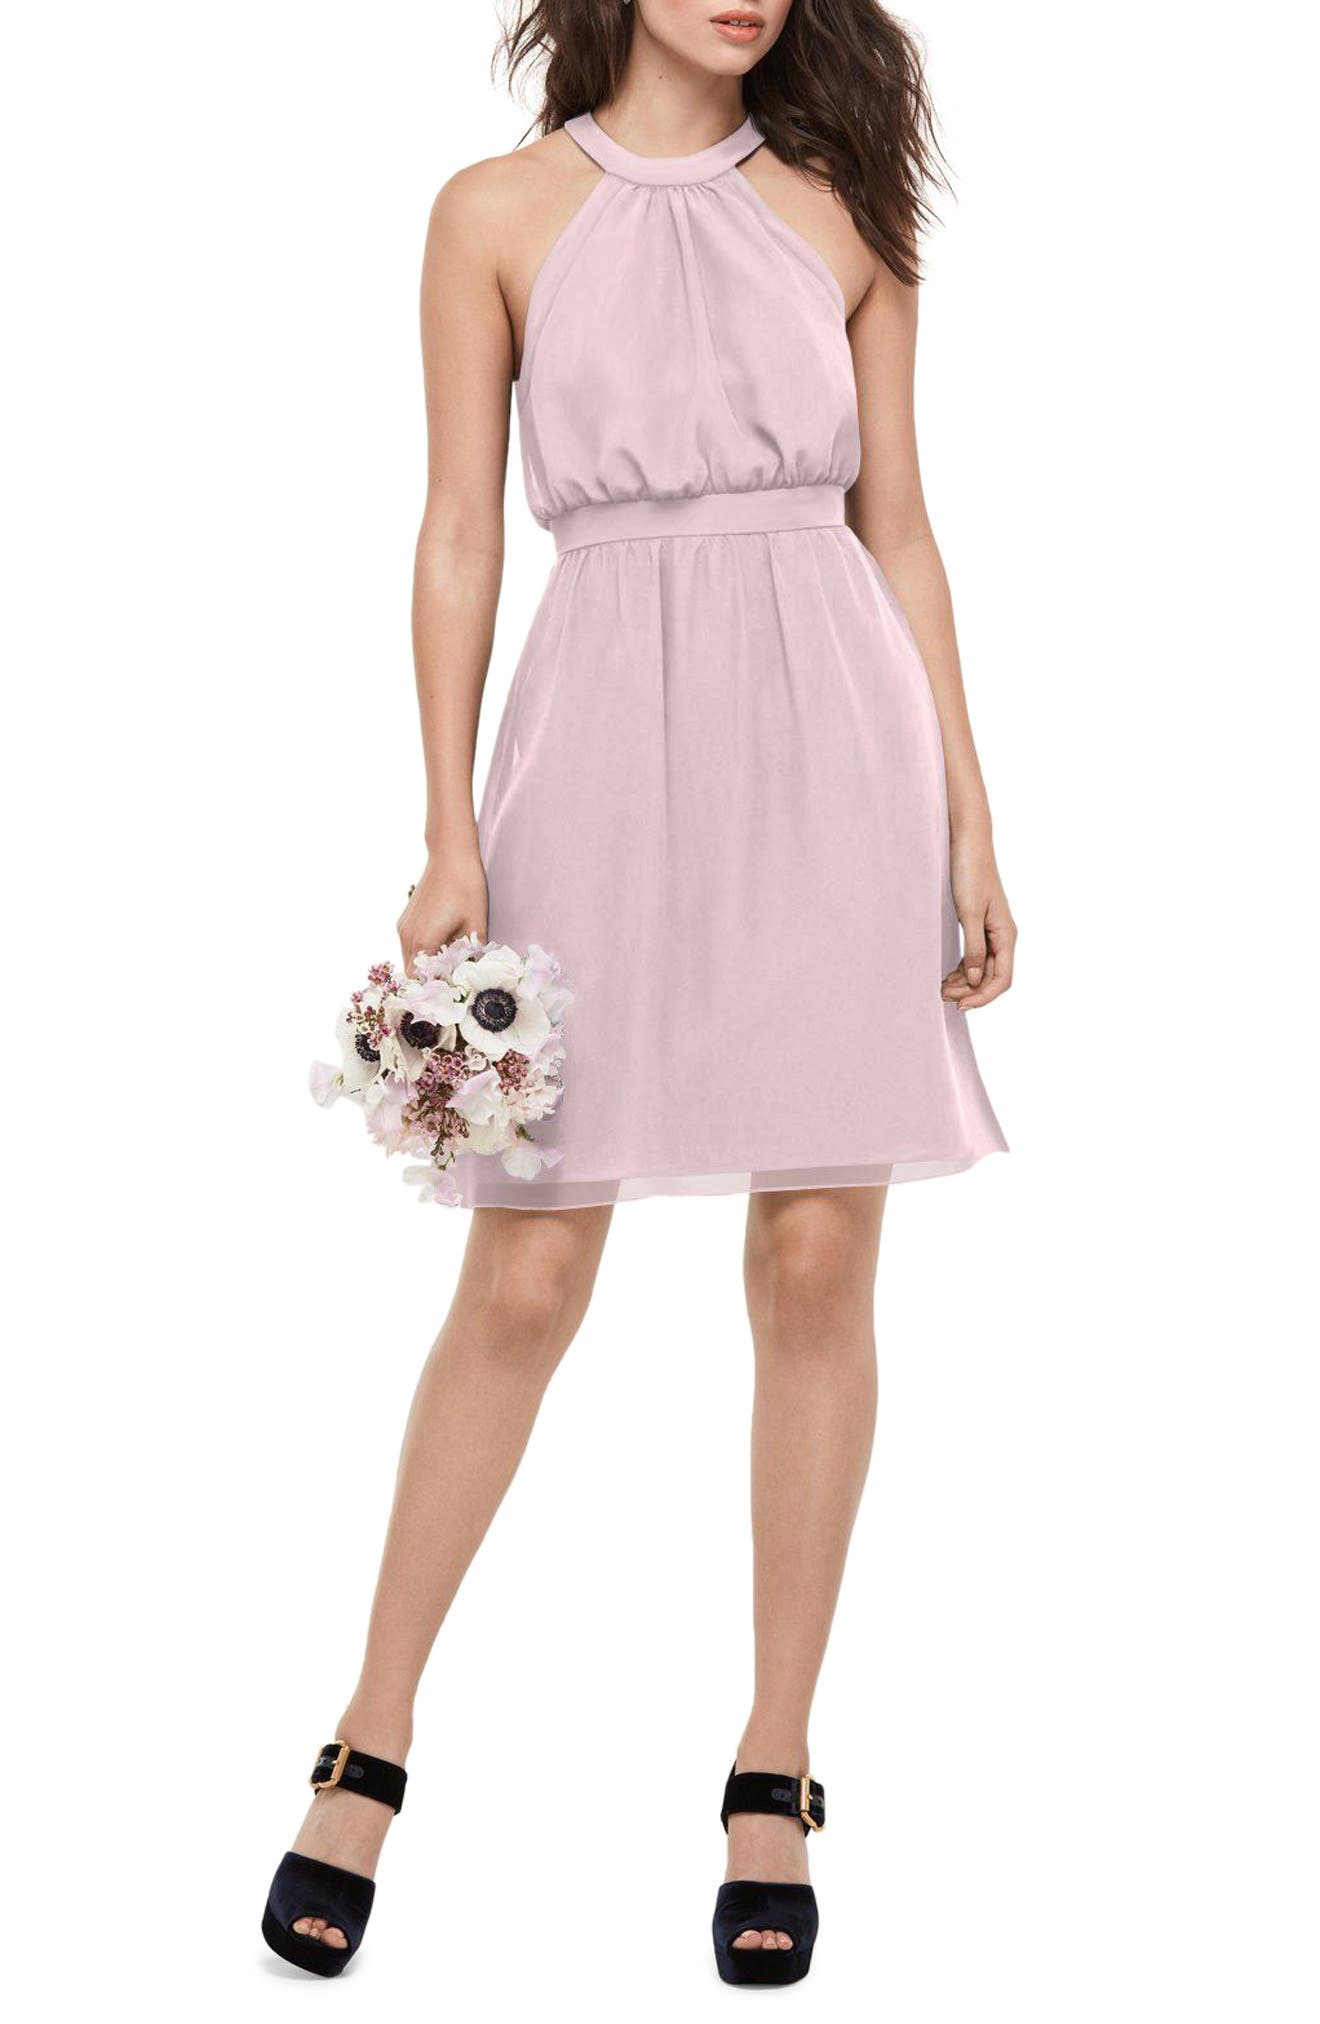 Alternate Image 1 Selected - WTOO Blouson Chiffon Dress